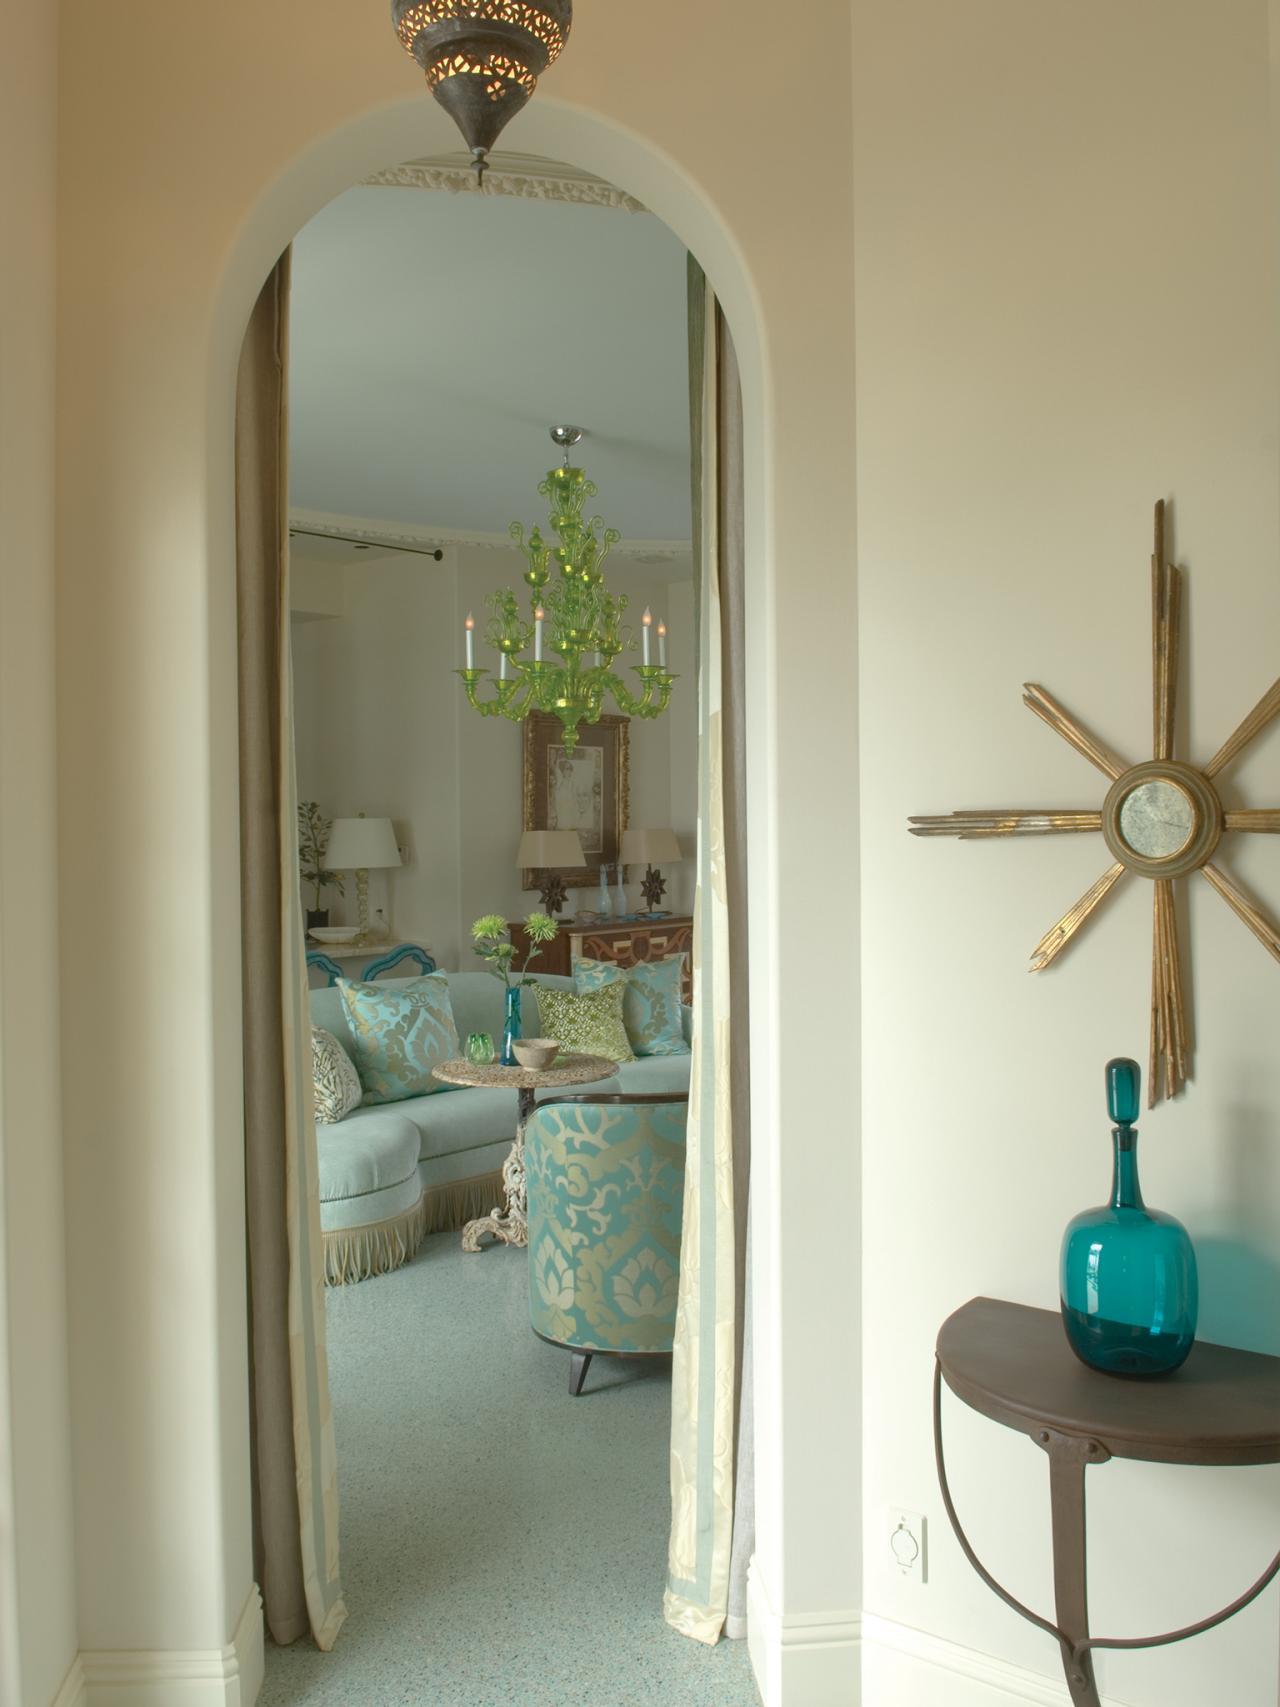 ci-barry-dixon-interiors_pg149_vestibule-archway_3x4-jpg-rend-hgtvcom-1280-1707